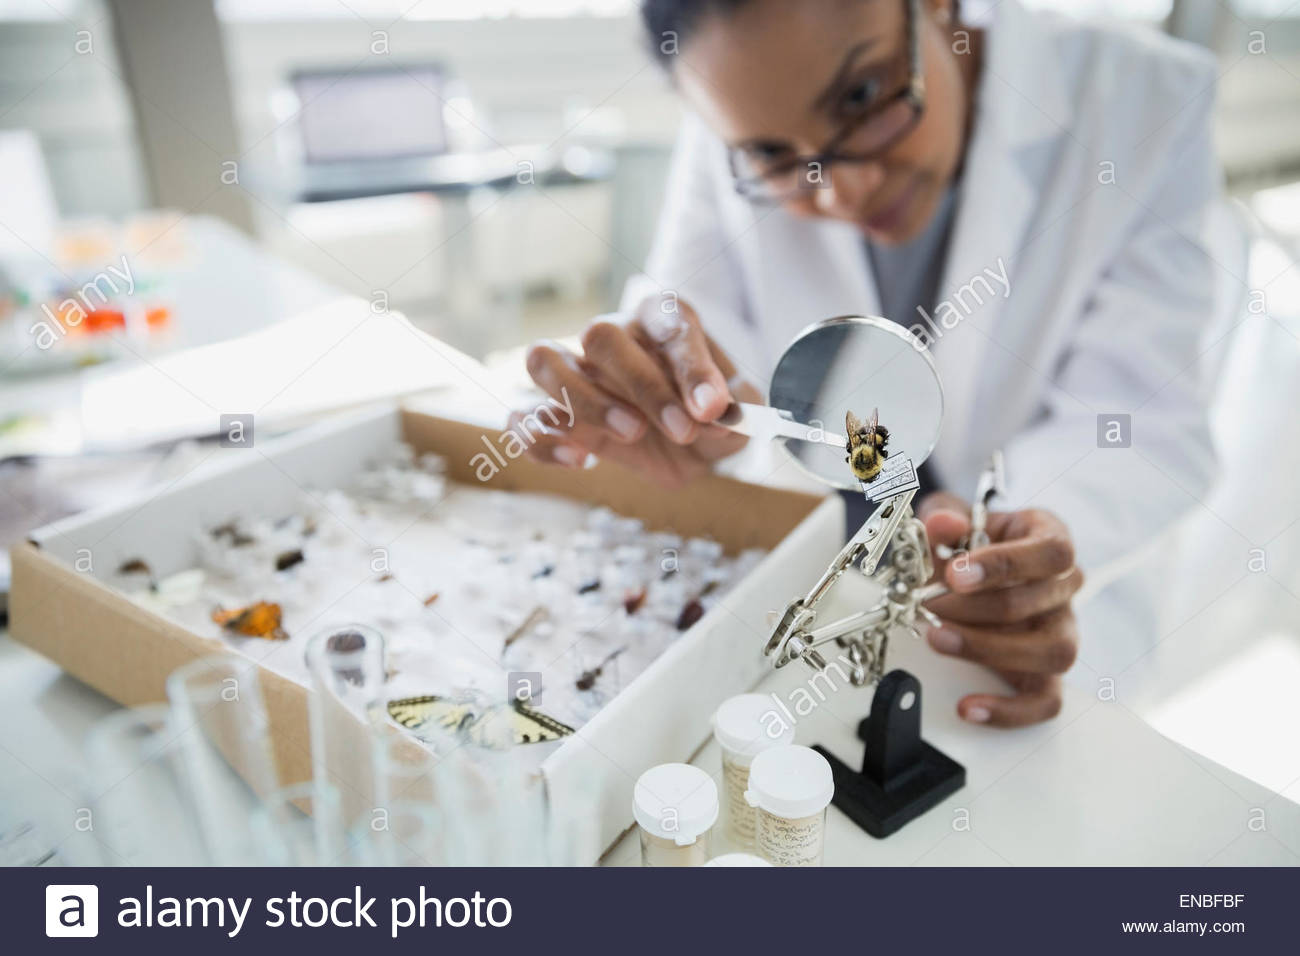 Scientist examining insect specimen under microscope - Stock Image